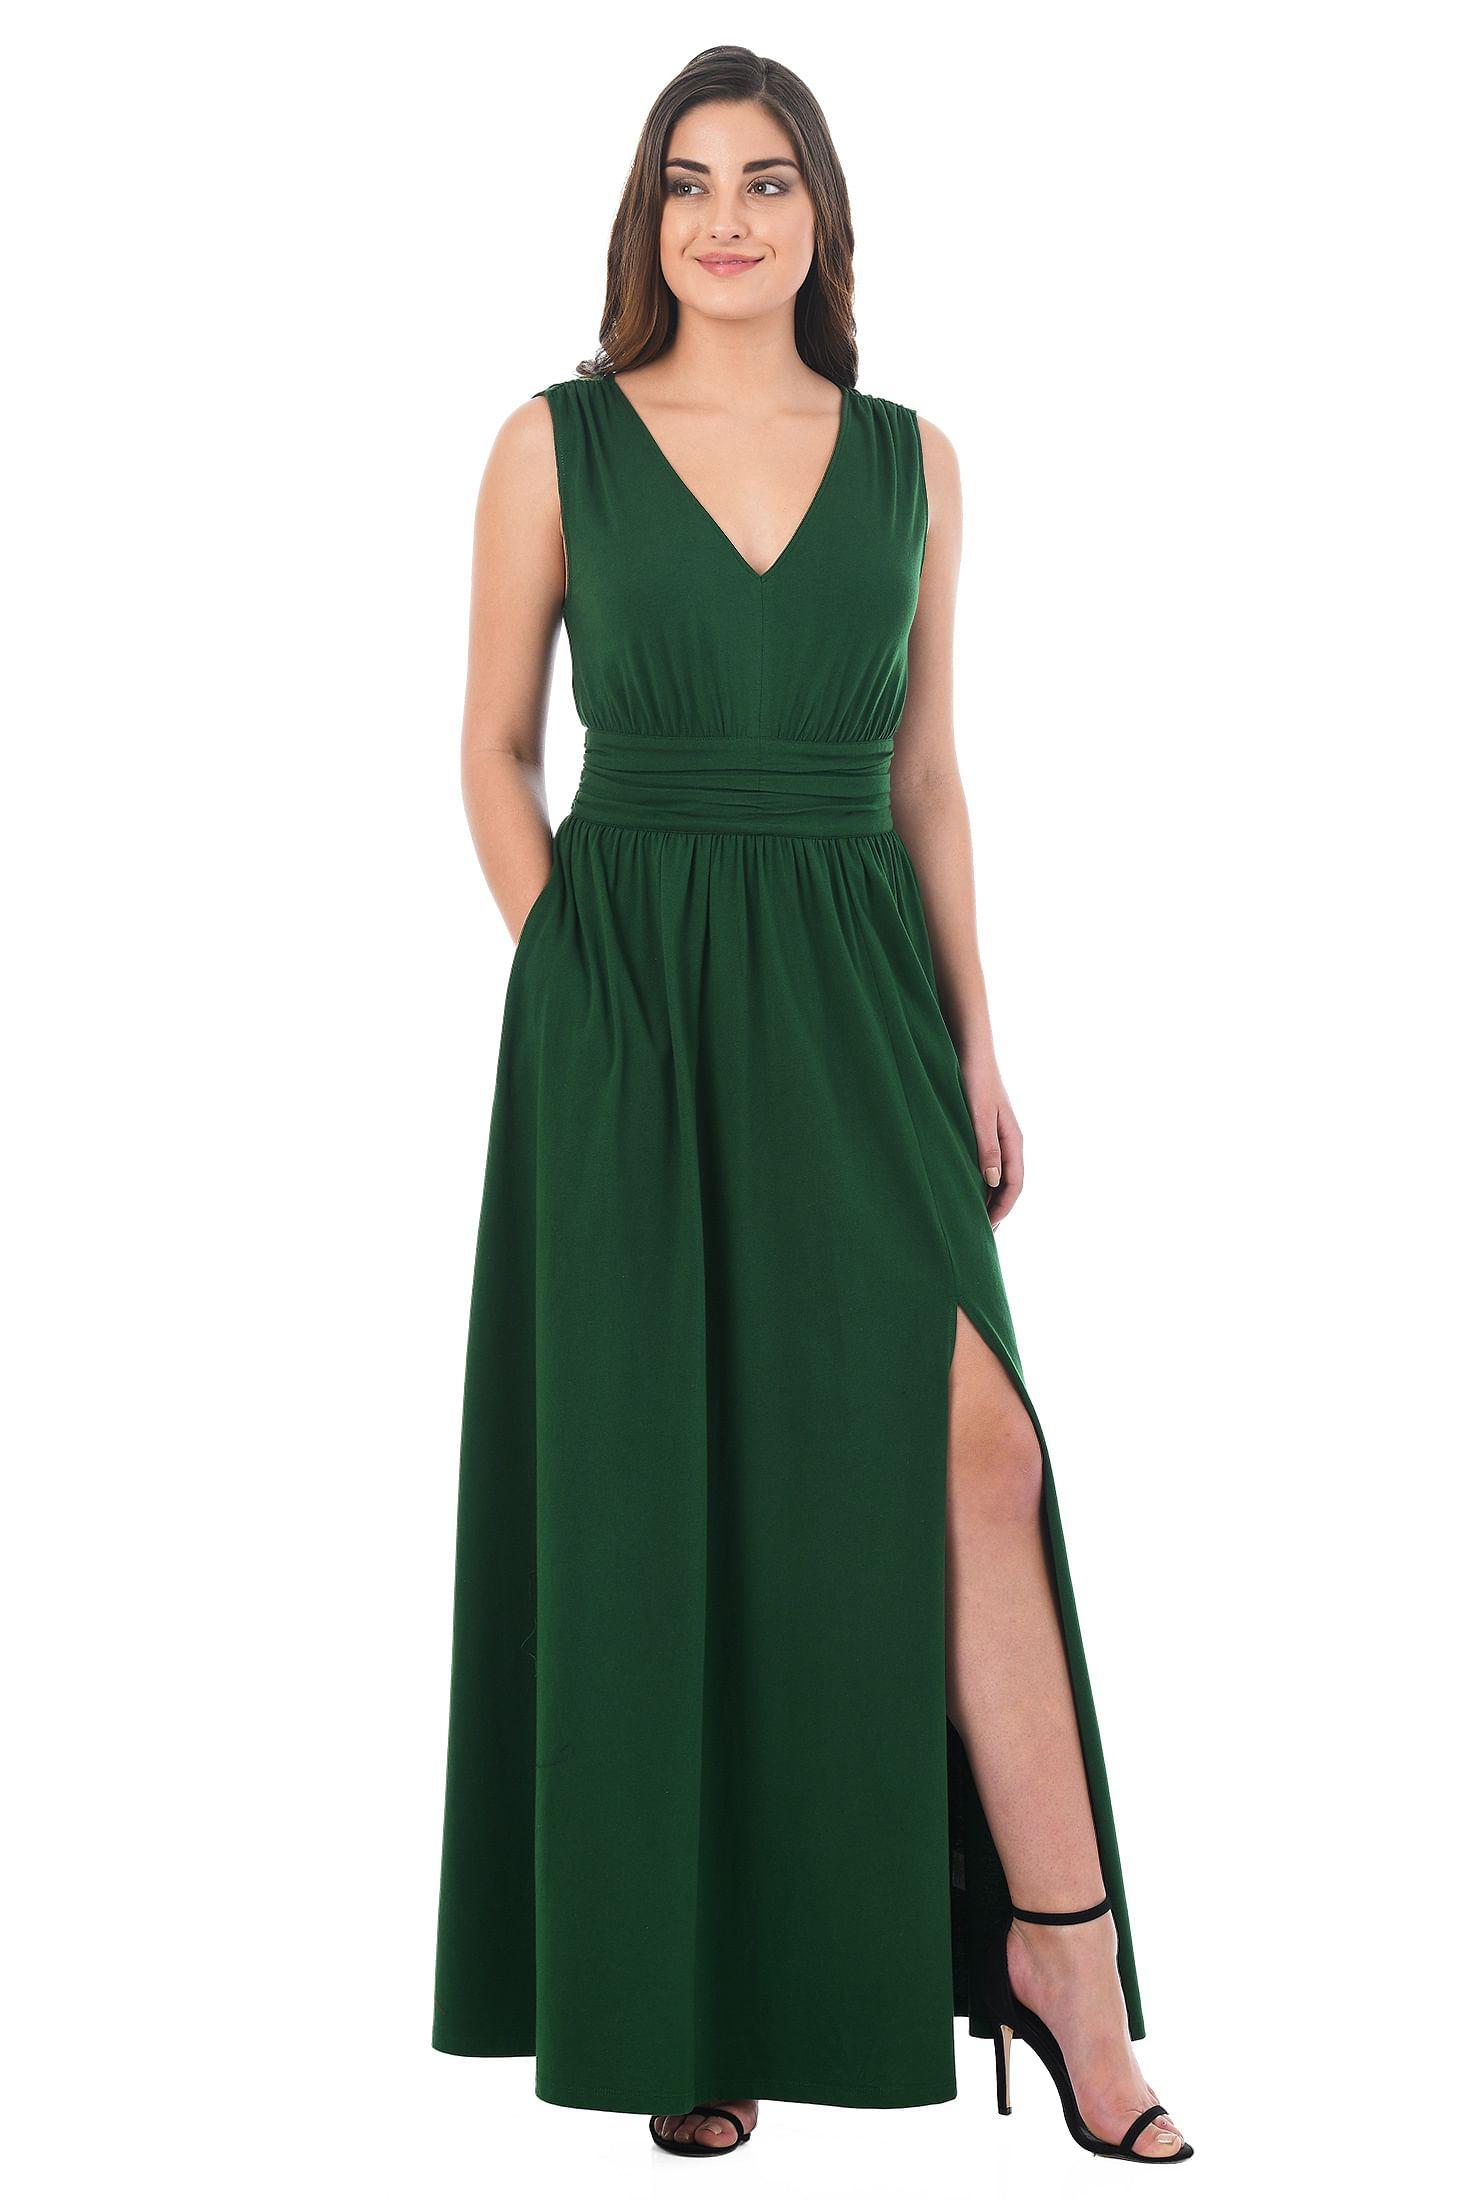 df07a7026e bottle green dresses, cotton/spandex Dresses, Full Length Dresses, jersey  knit